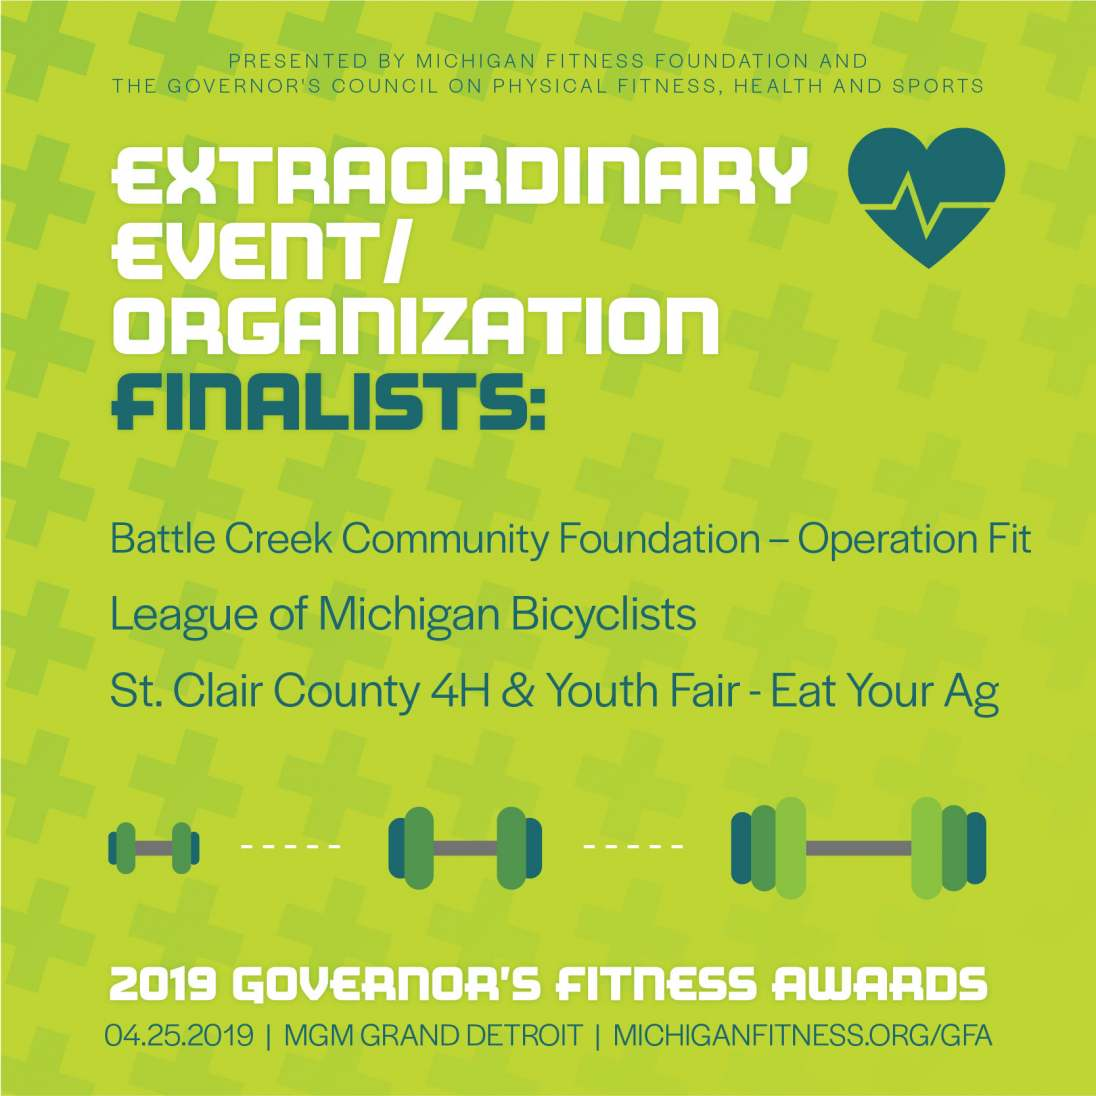 Governor's Fitness Awards - Extraordinary Event/Organization